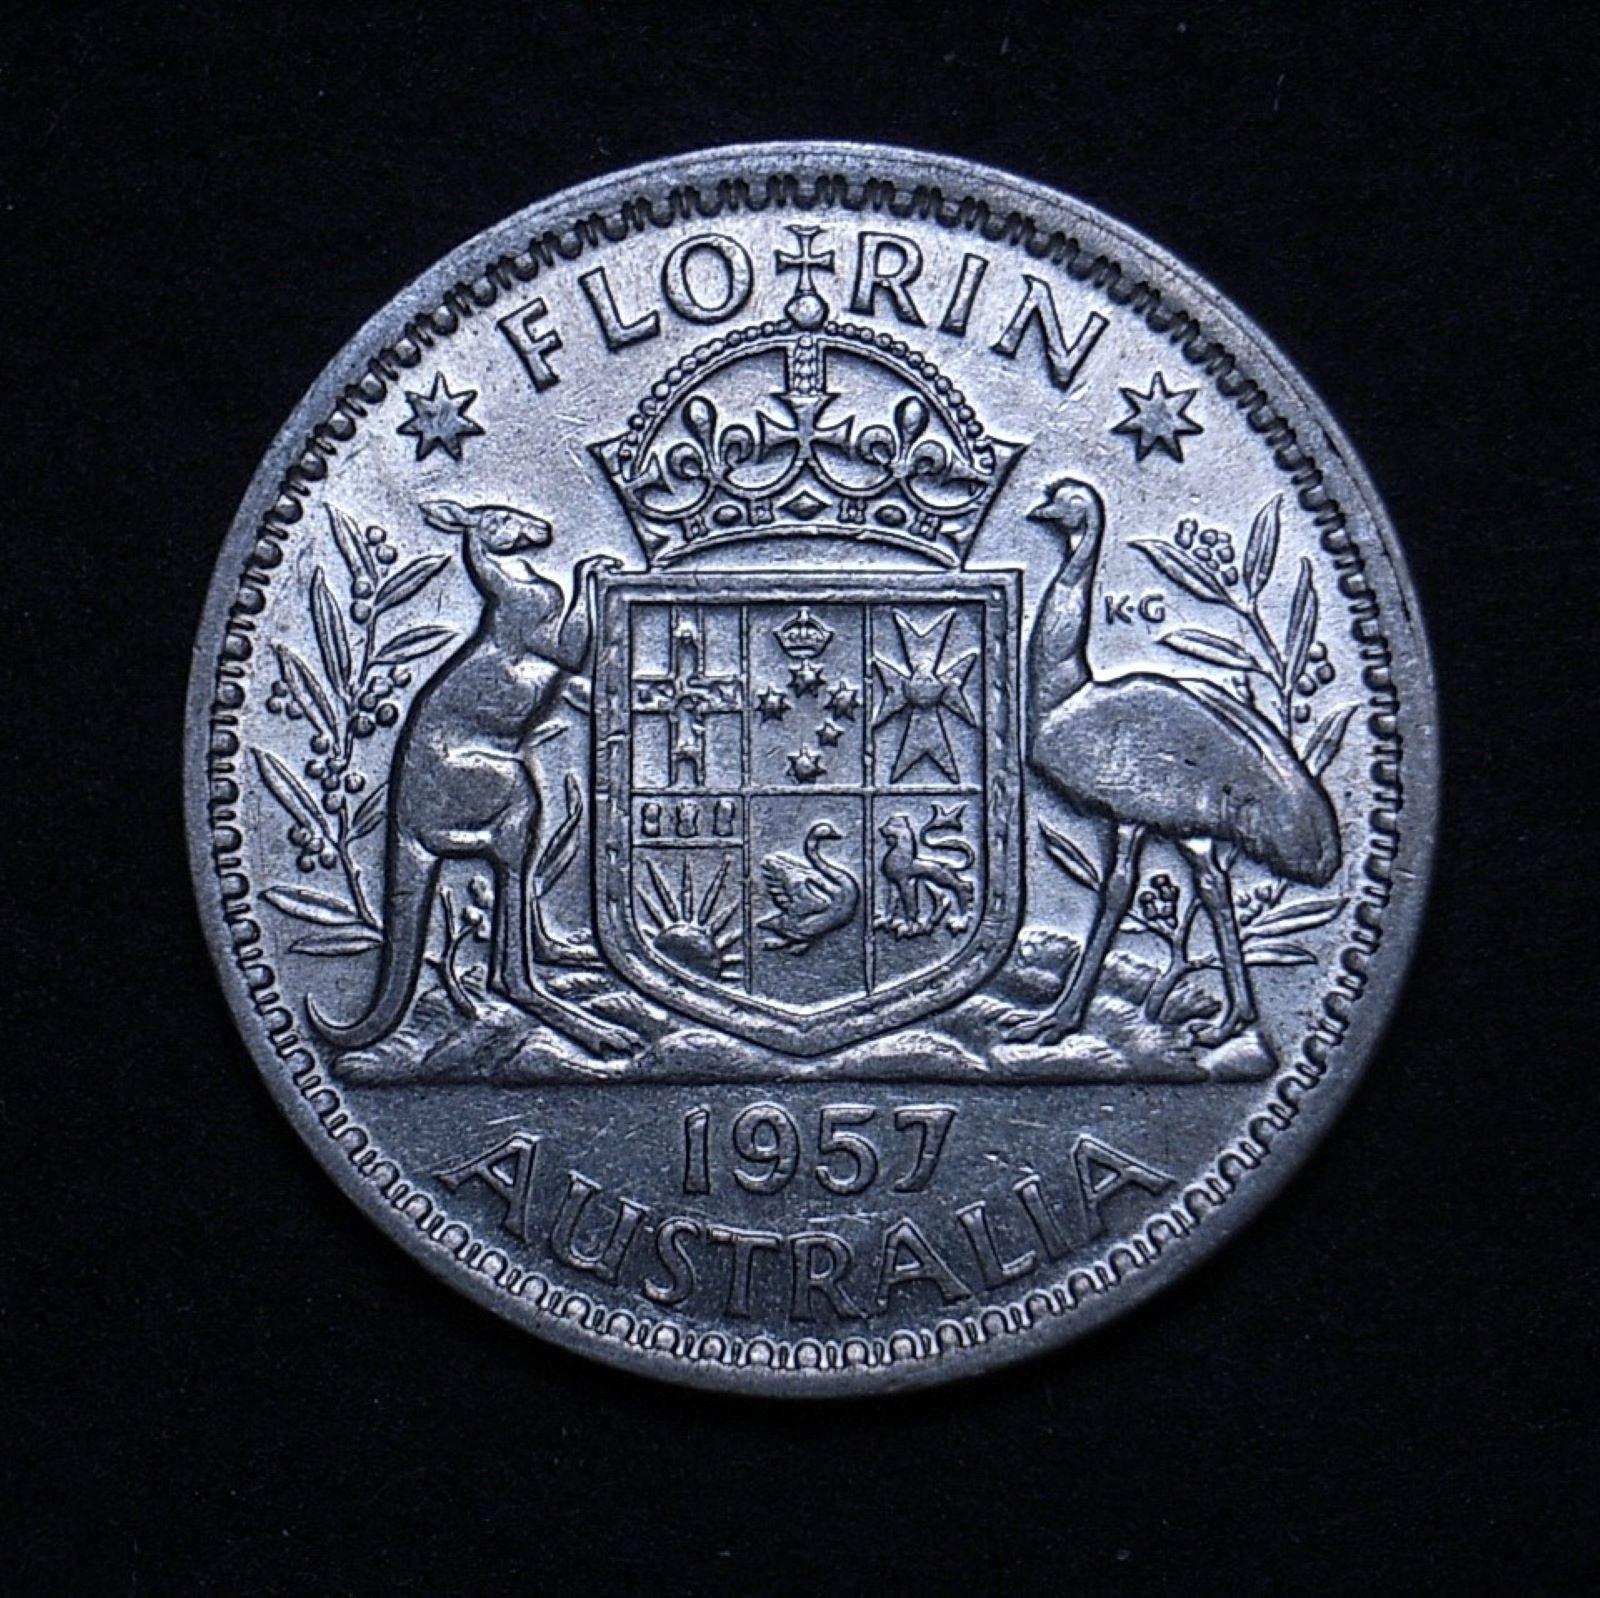 Aus Florin 1957 rev 1